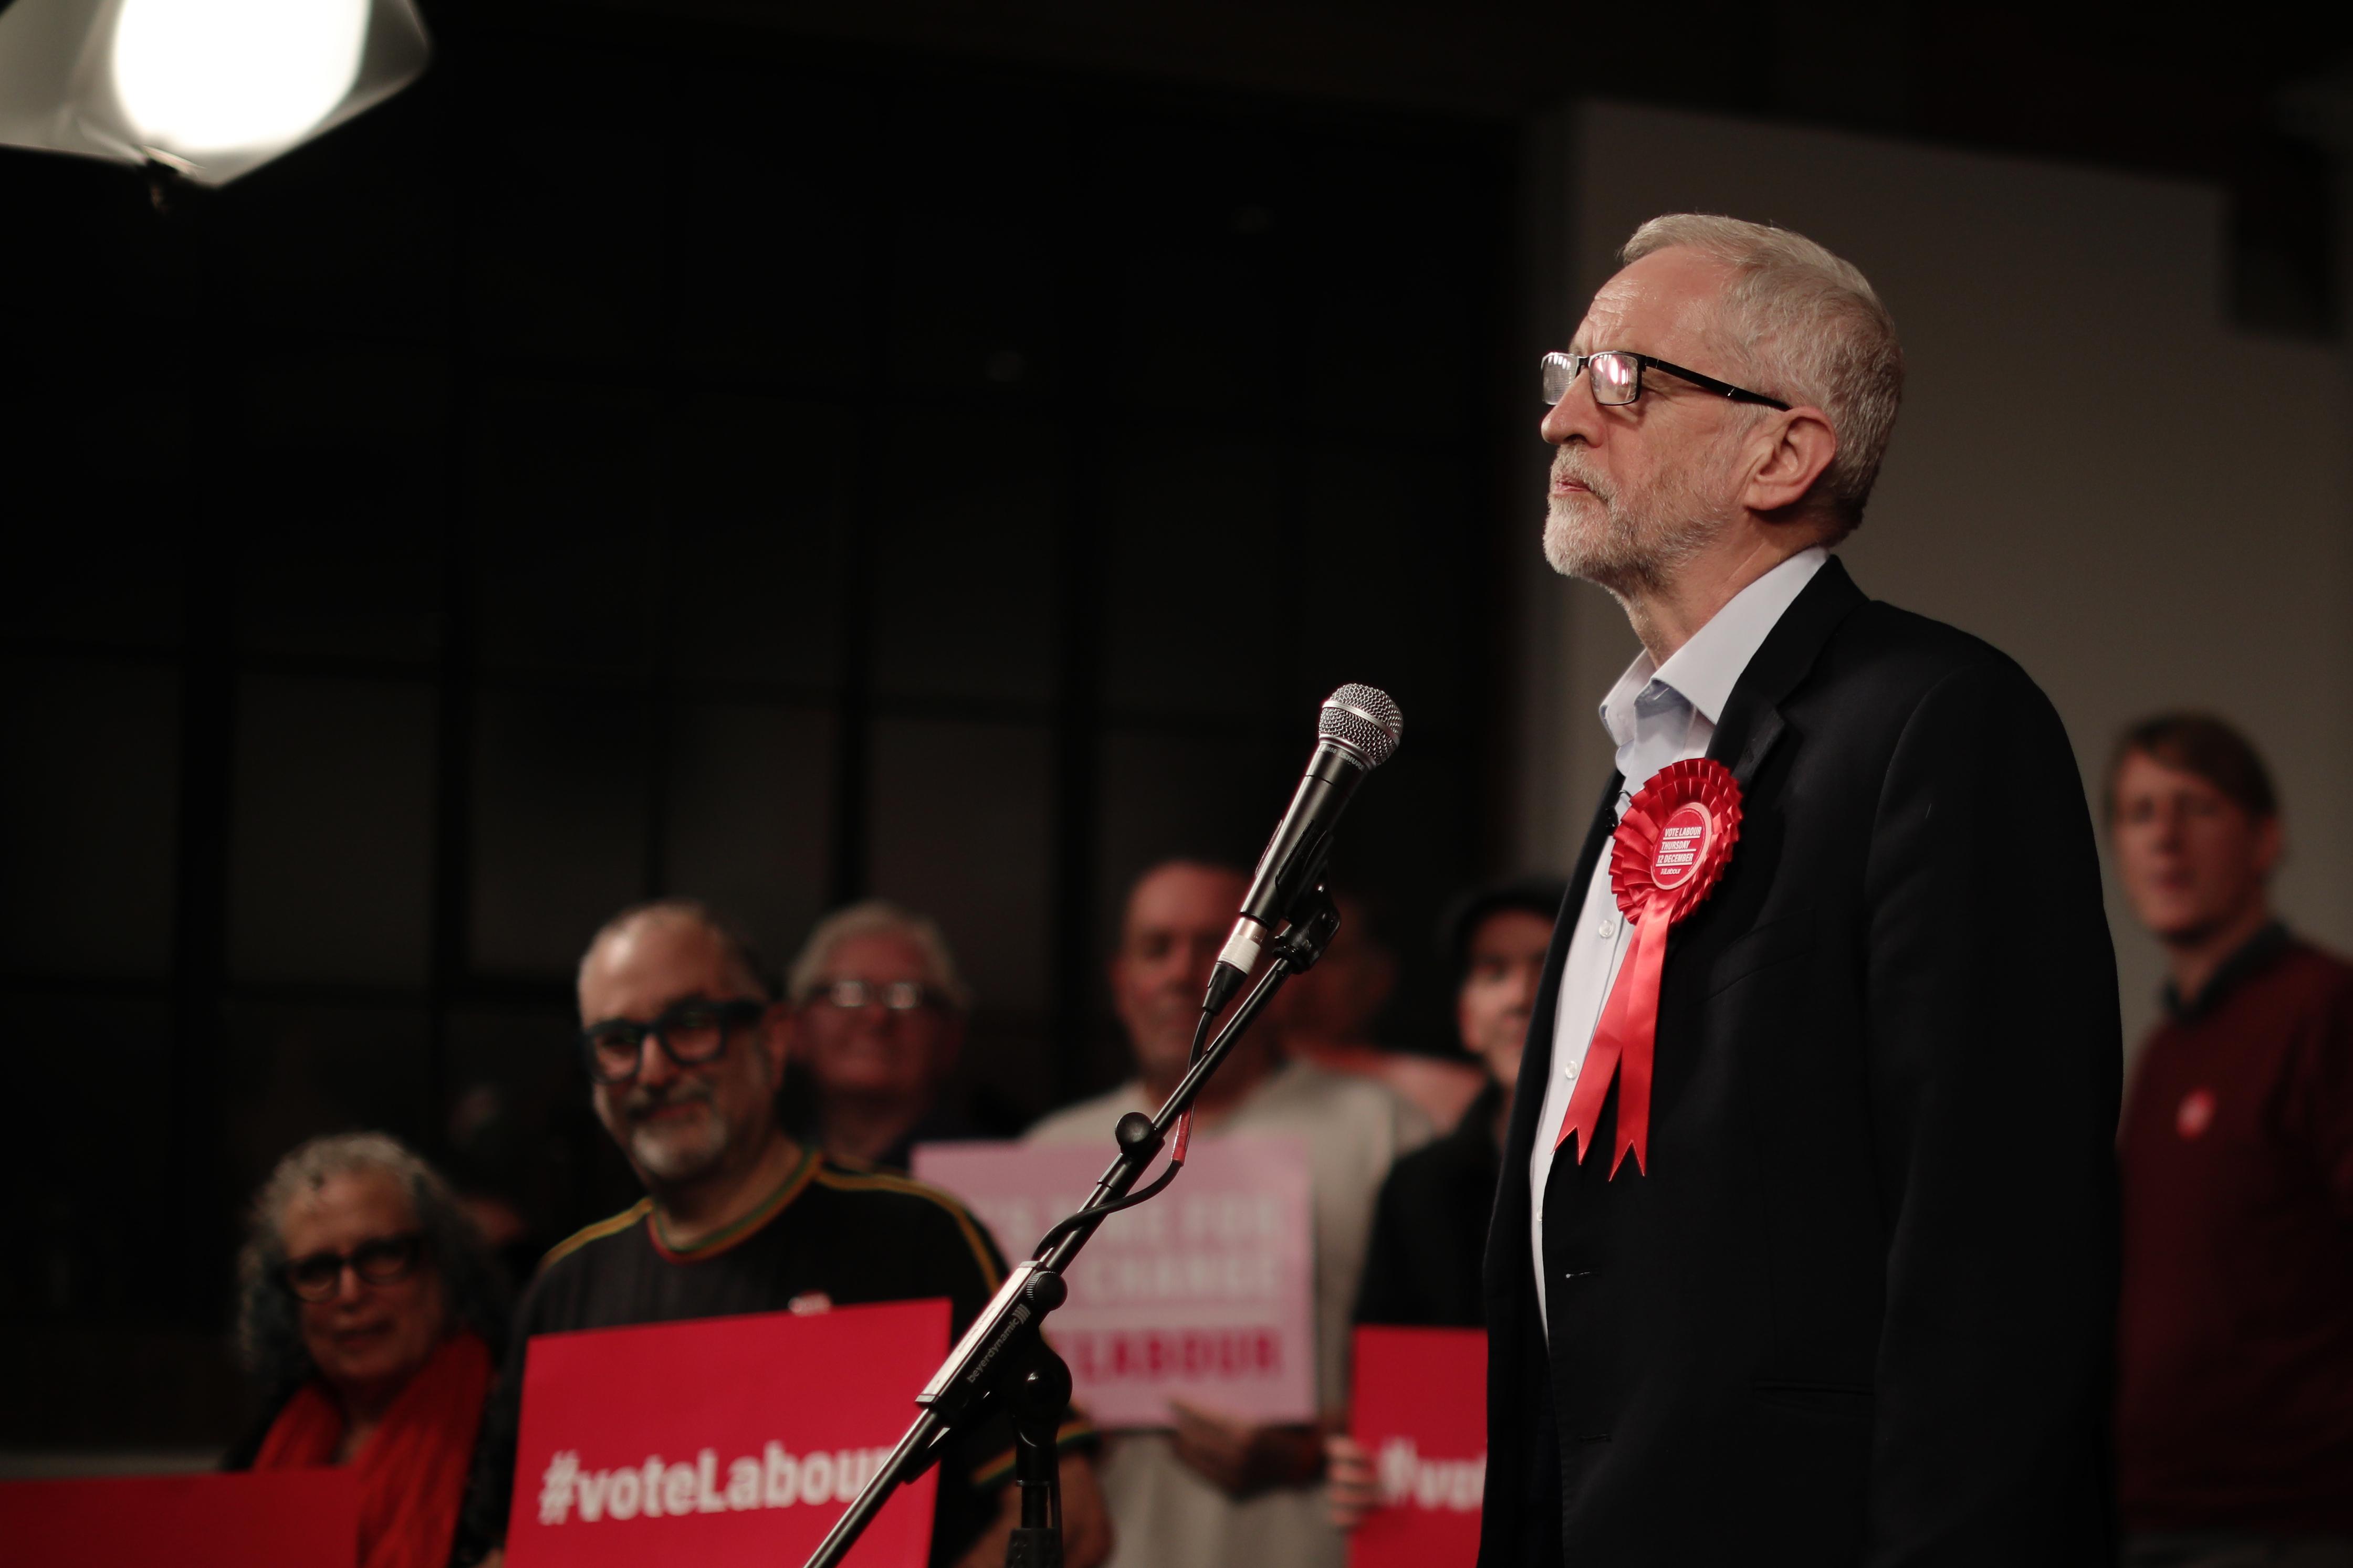 The fall of Jeremy Corbyn